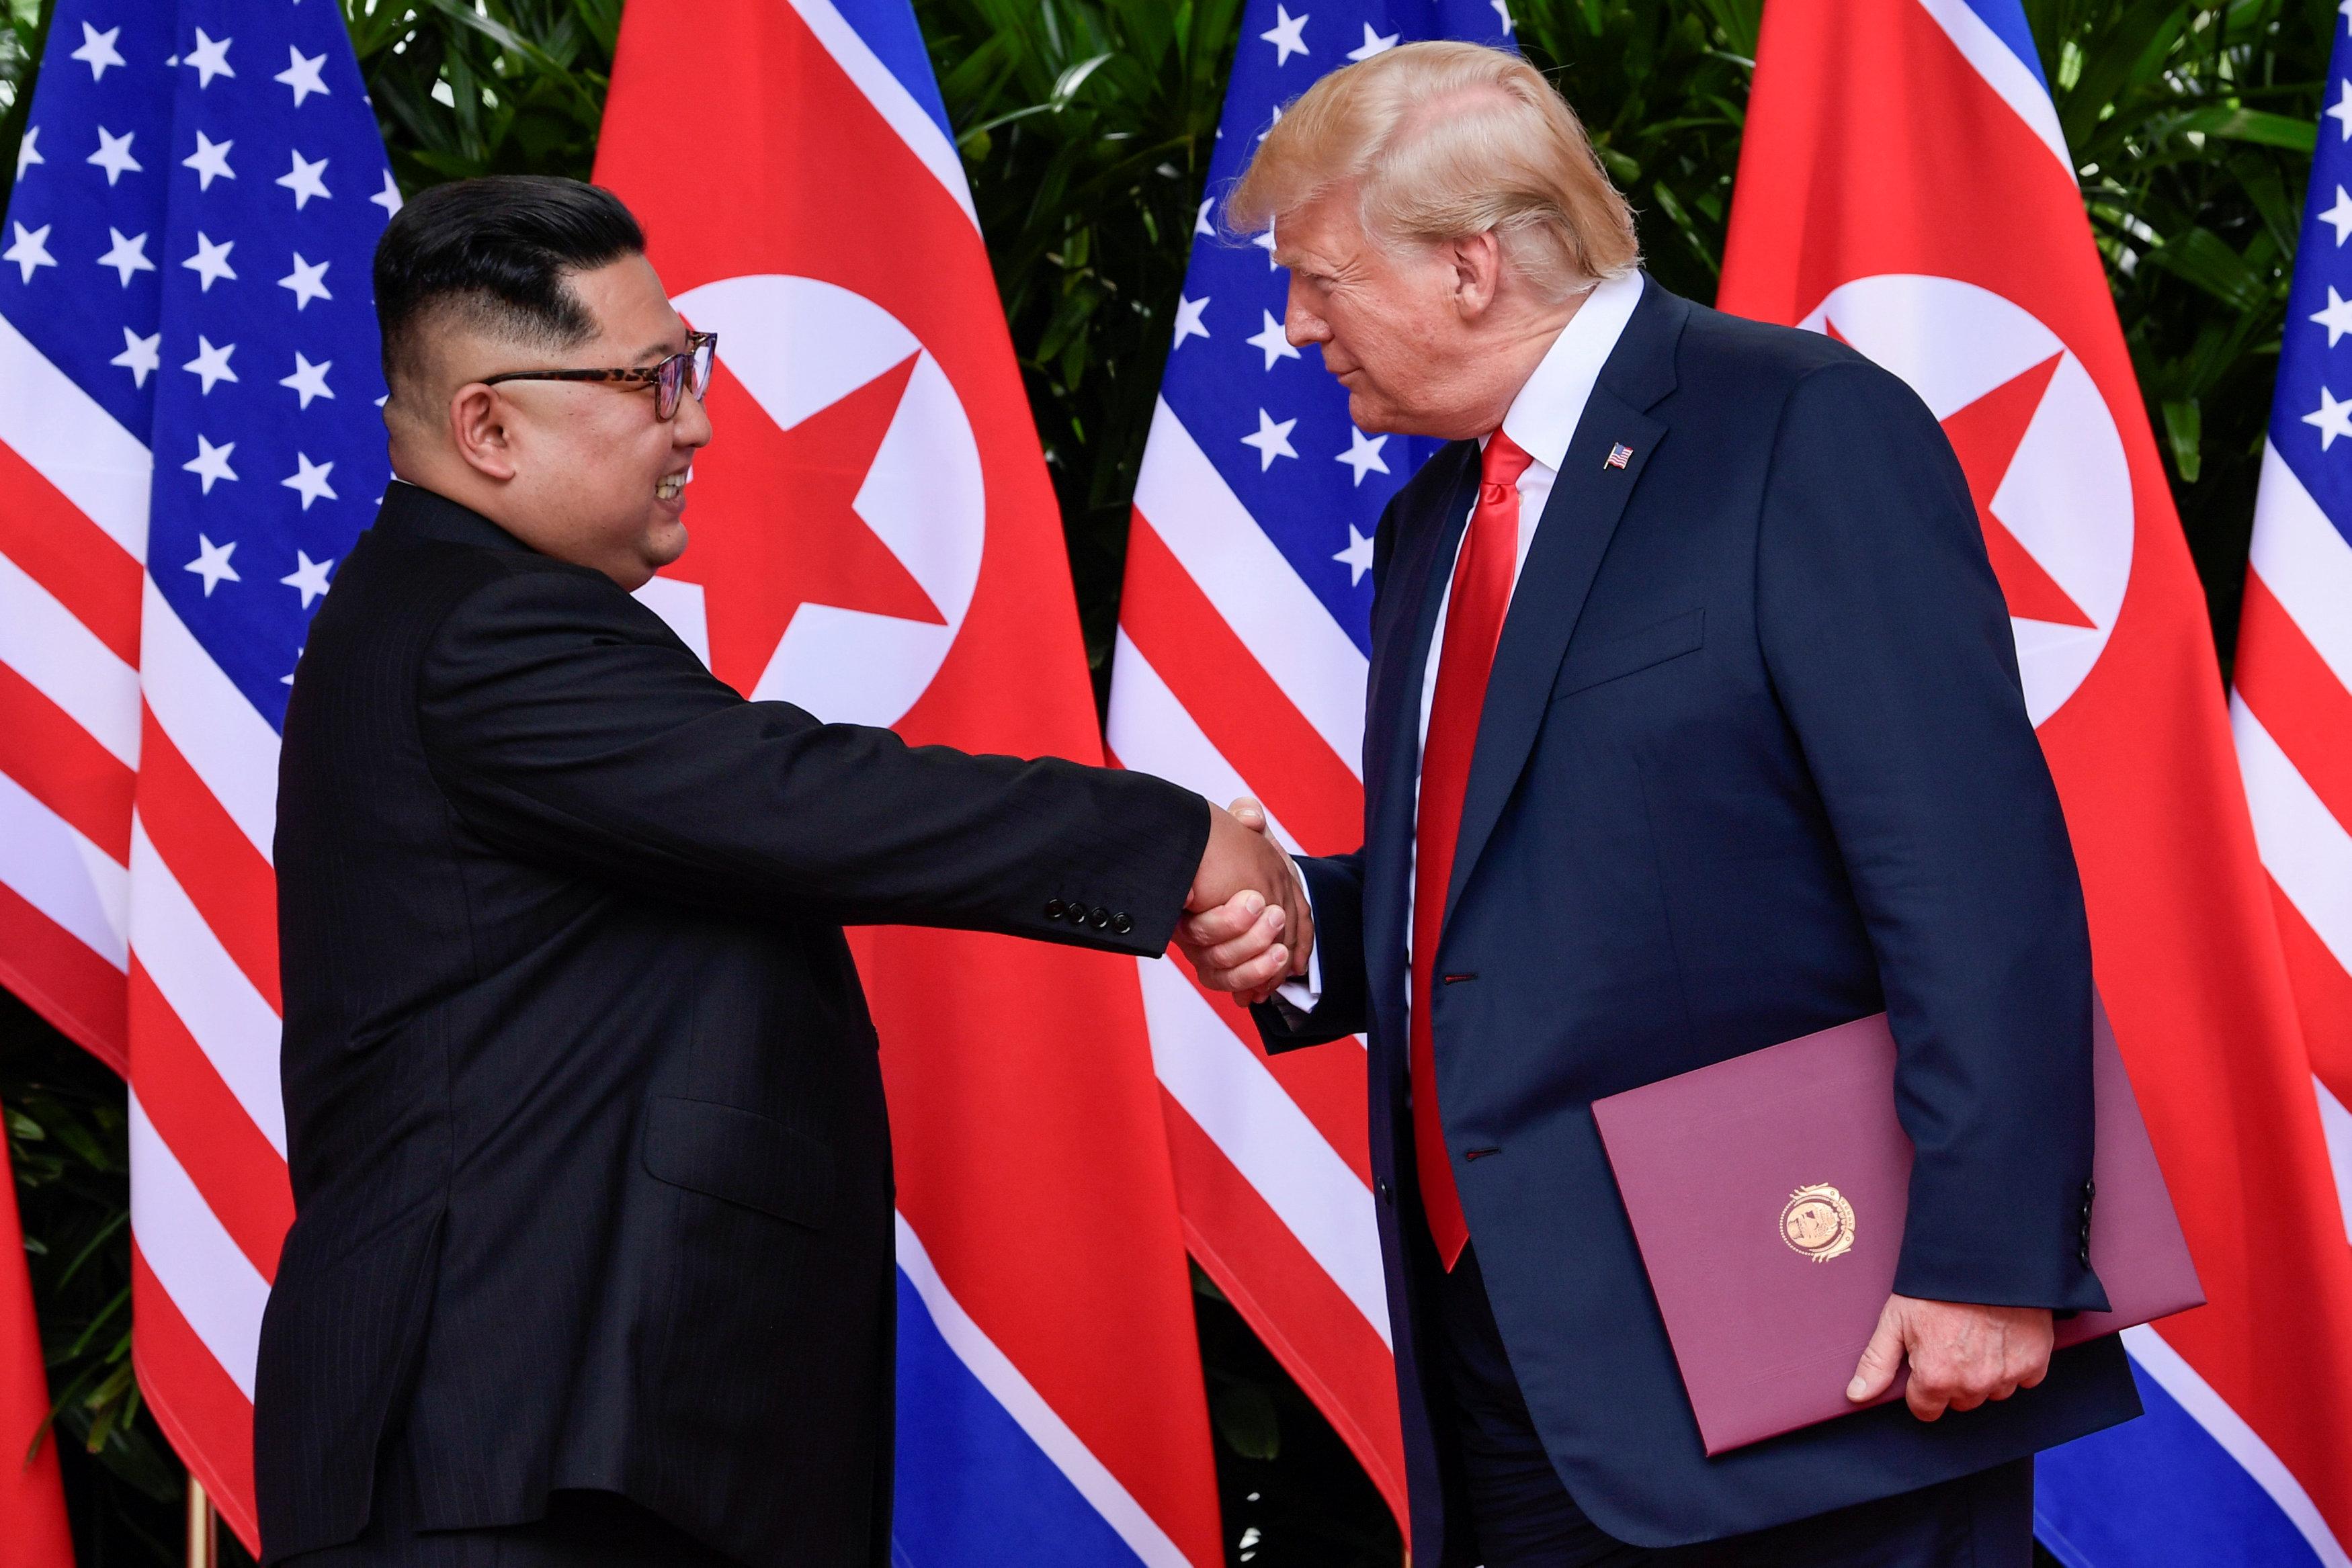 Trump and Kim shake hands at Singapore summit